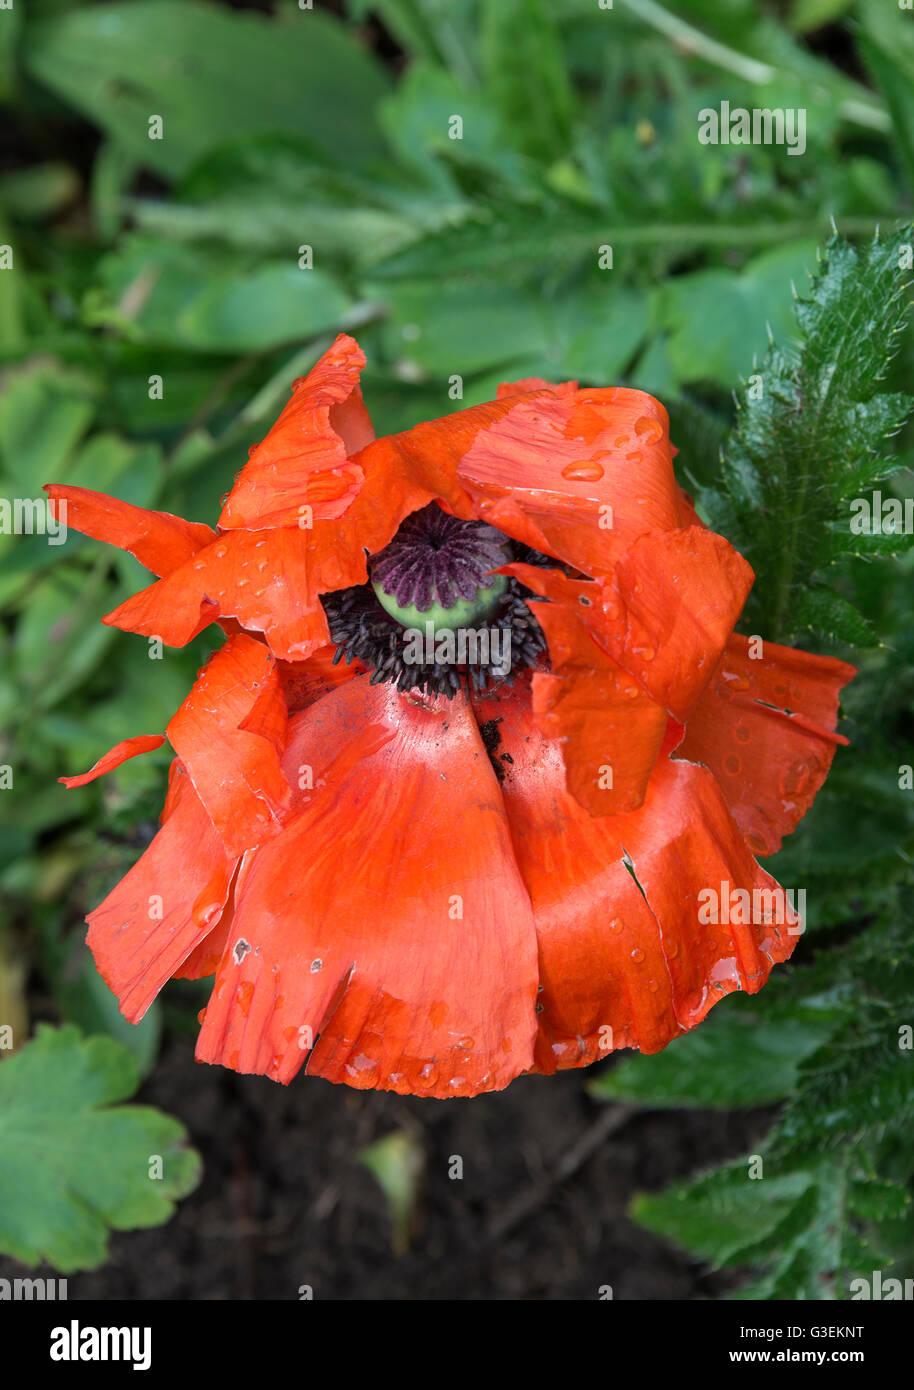 A single bright red oriental poppy flower in full bloom in a a single bright red oriental poppy flower in full bloom in a cheshire garden alsager england united kingdom uk mightylinksfo